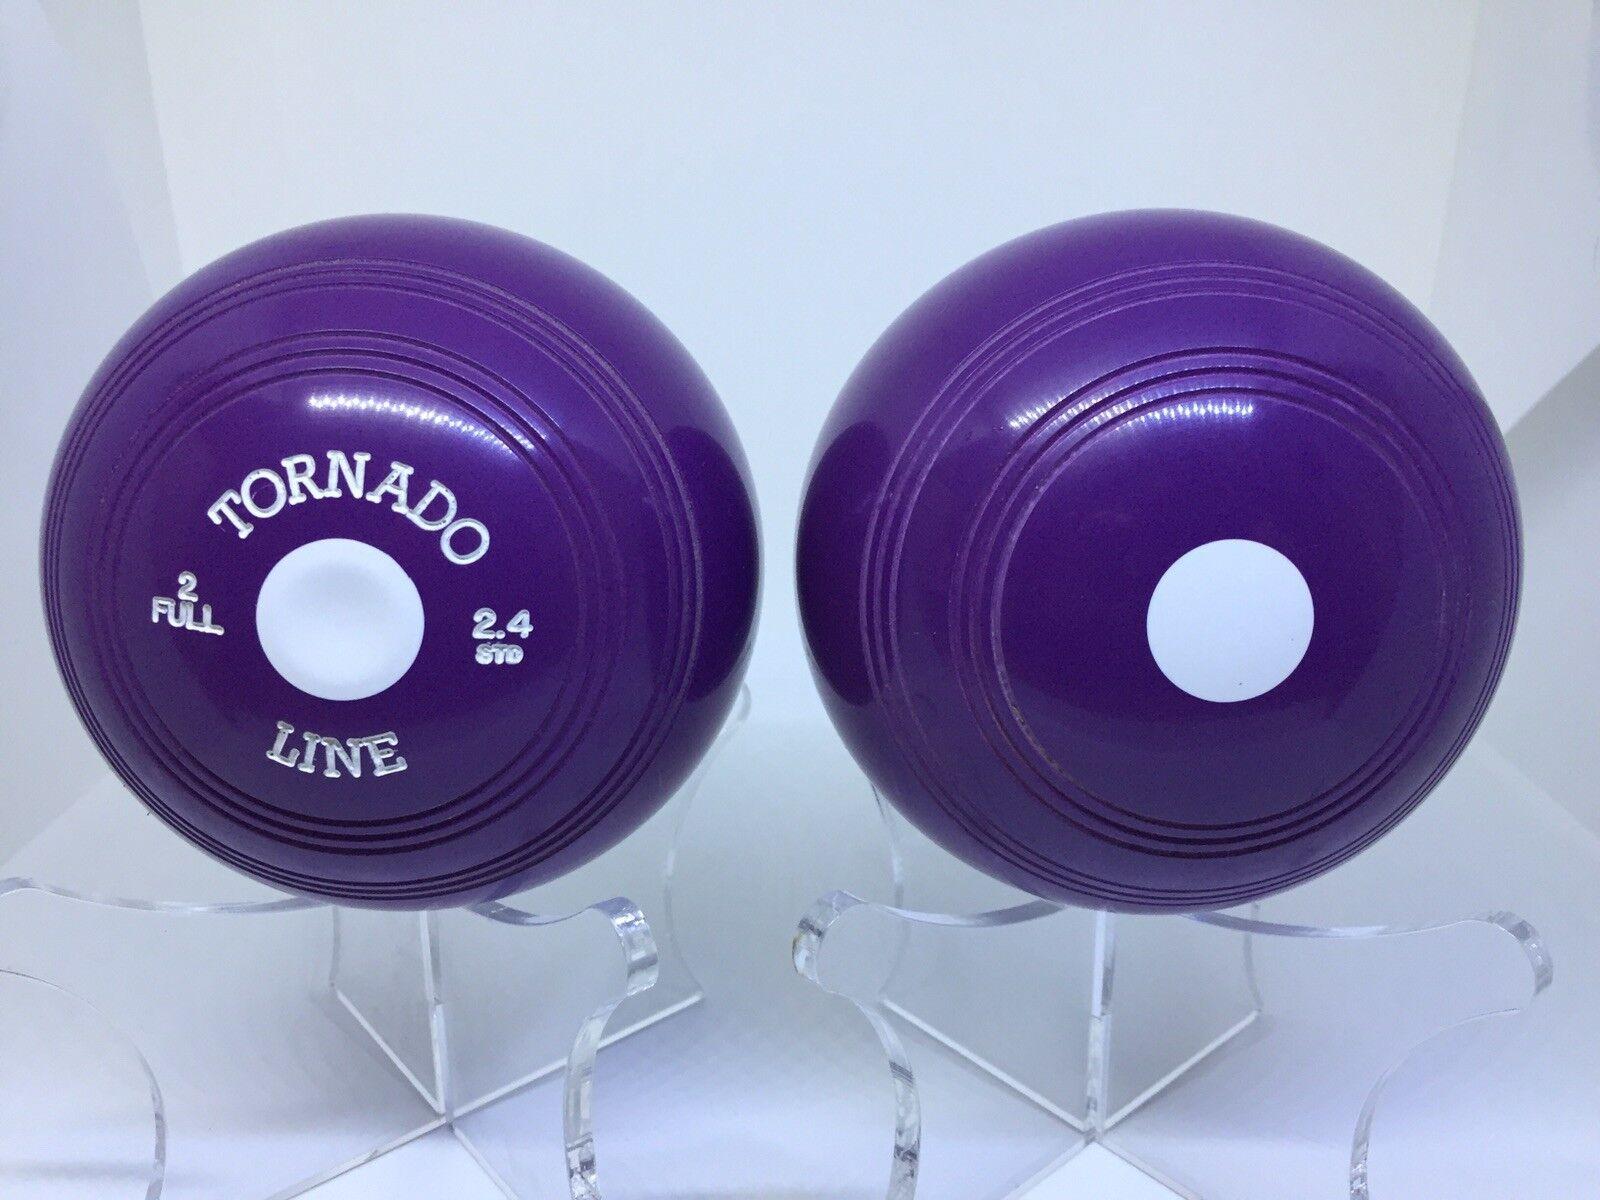 Tornado Line Crown Grün Bowls Lilac